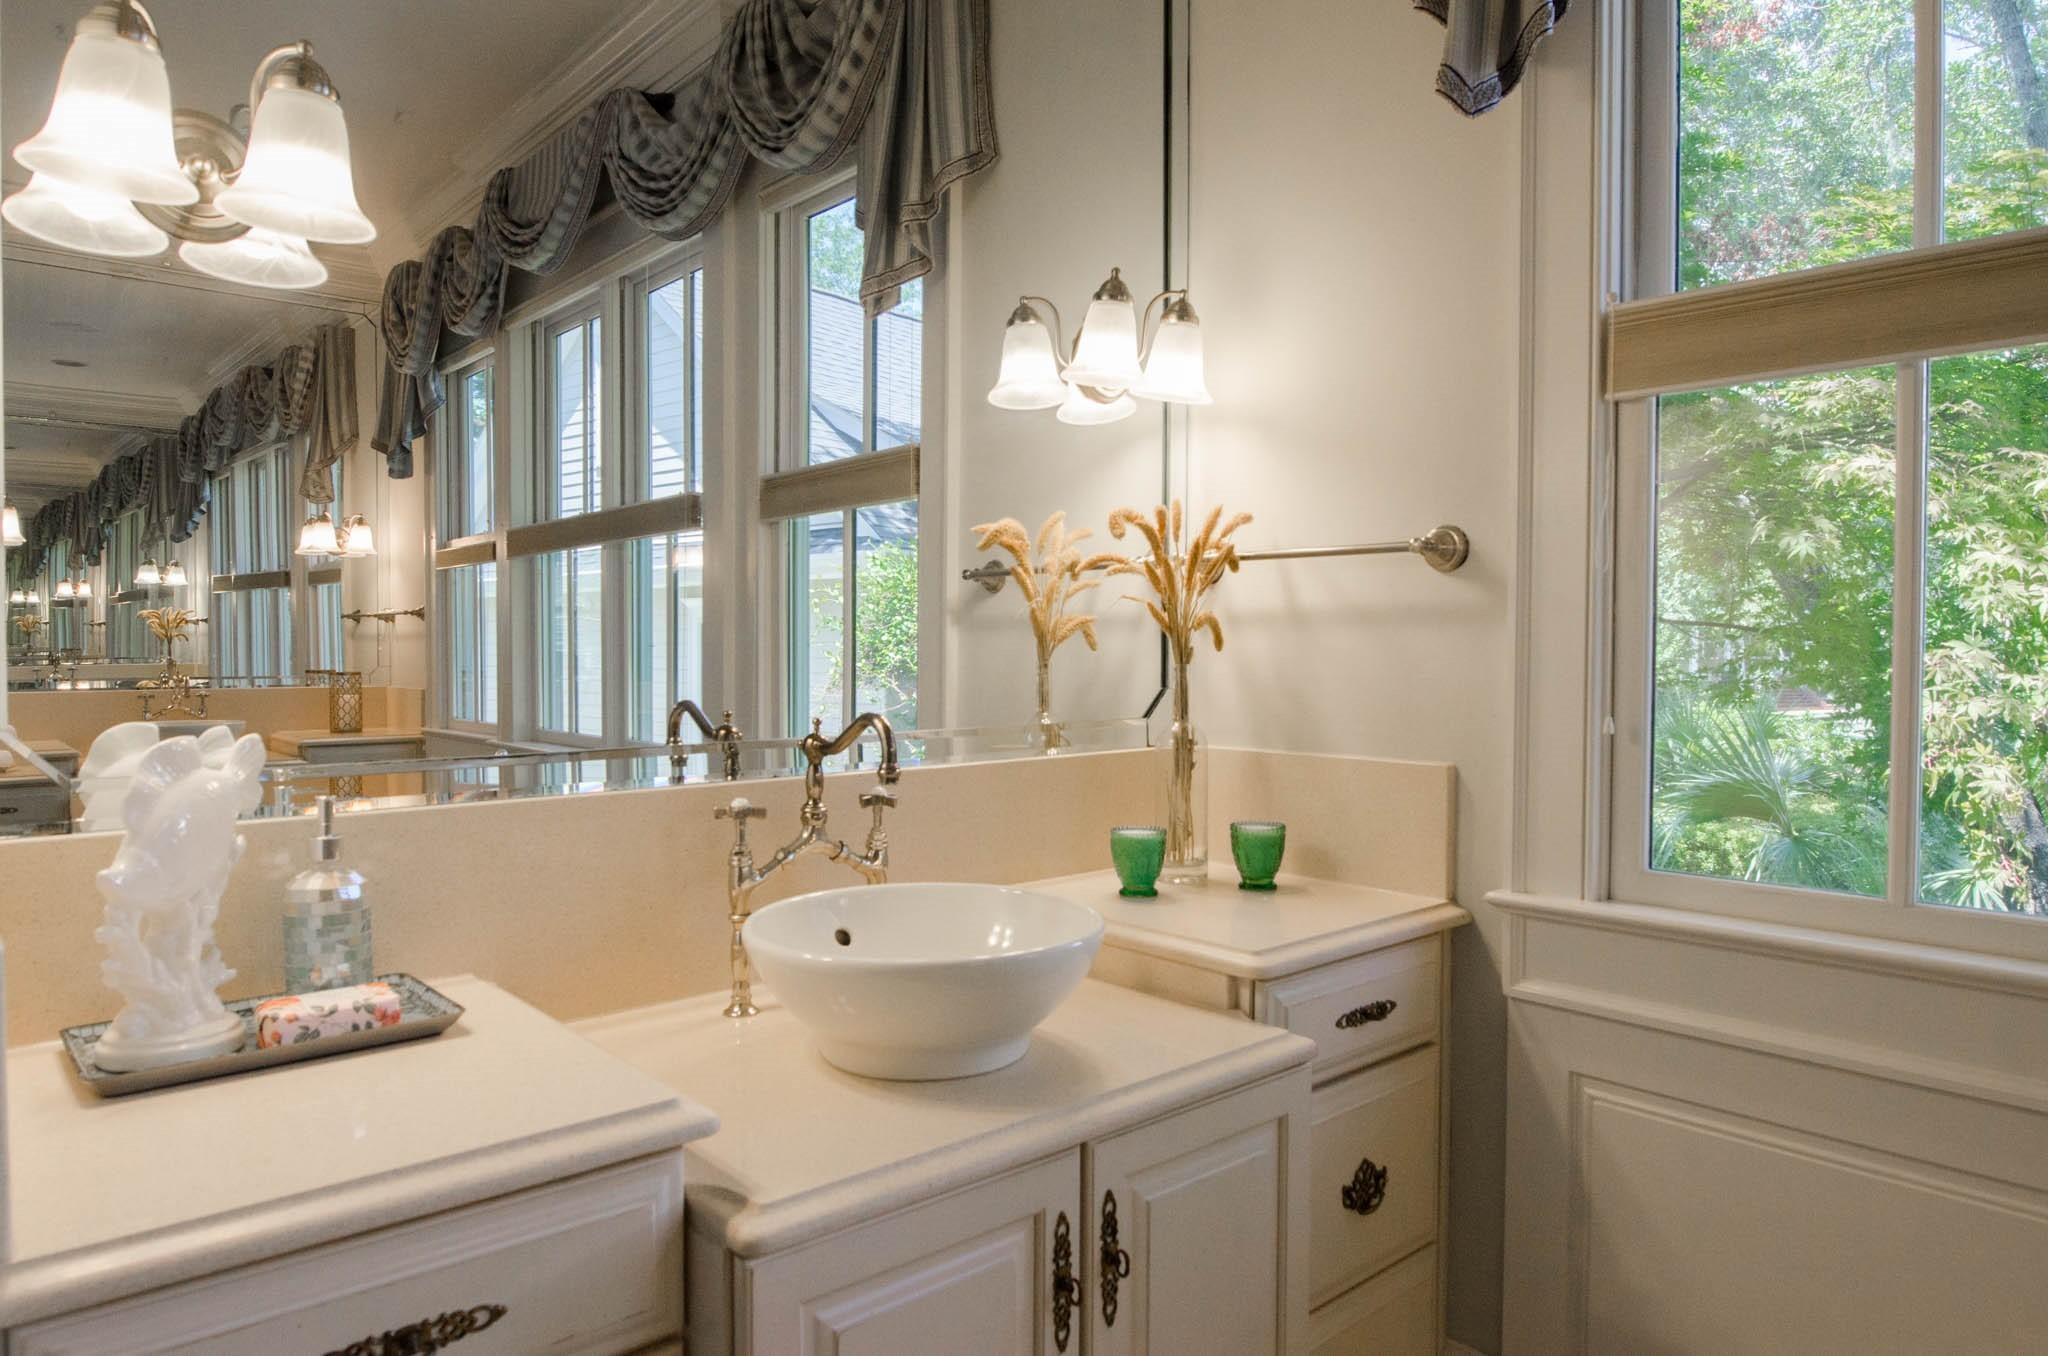 Daniel Island Homes For Sale - 18 Watroo, Charleston, SC - 30